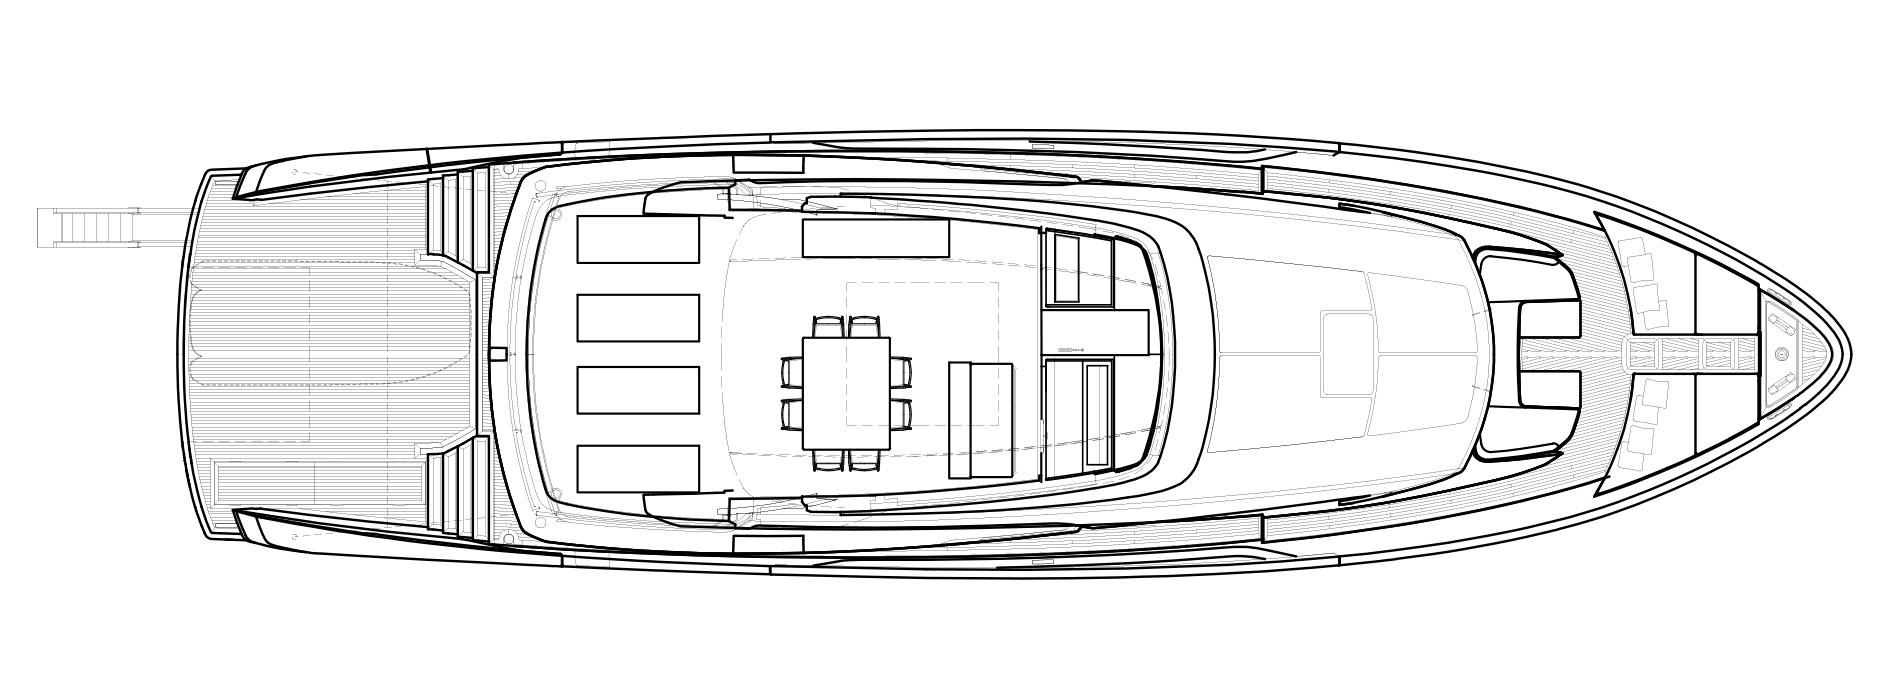 Sanlorenzo Yachts SX88 Flying bridge Version B